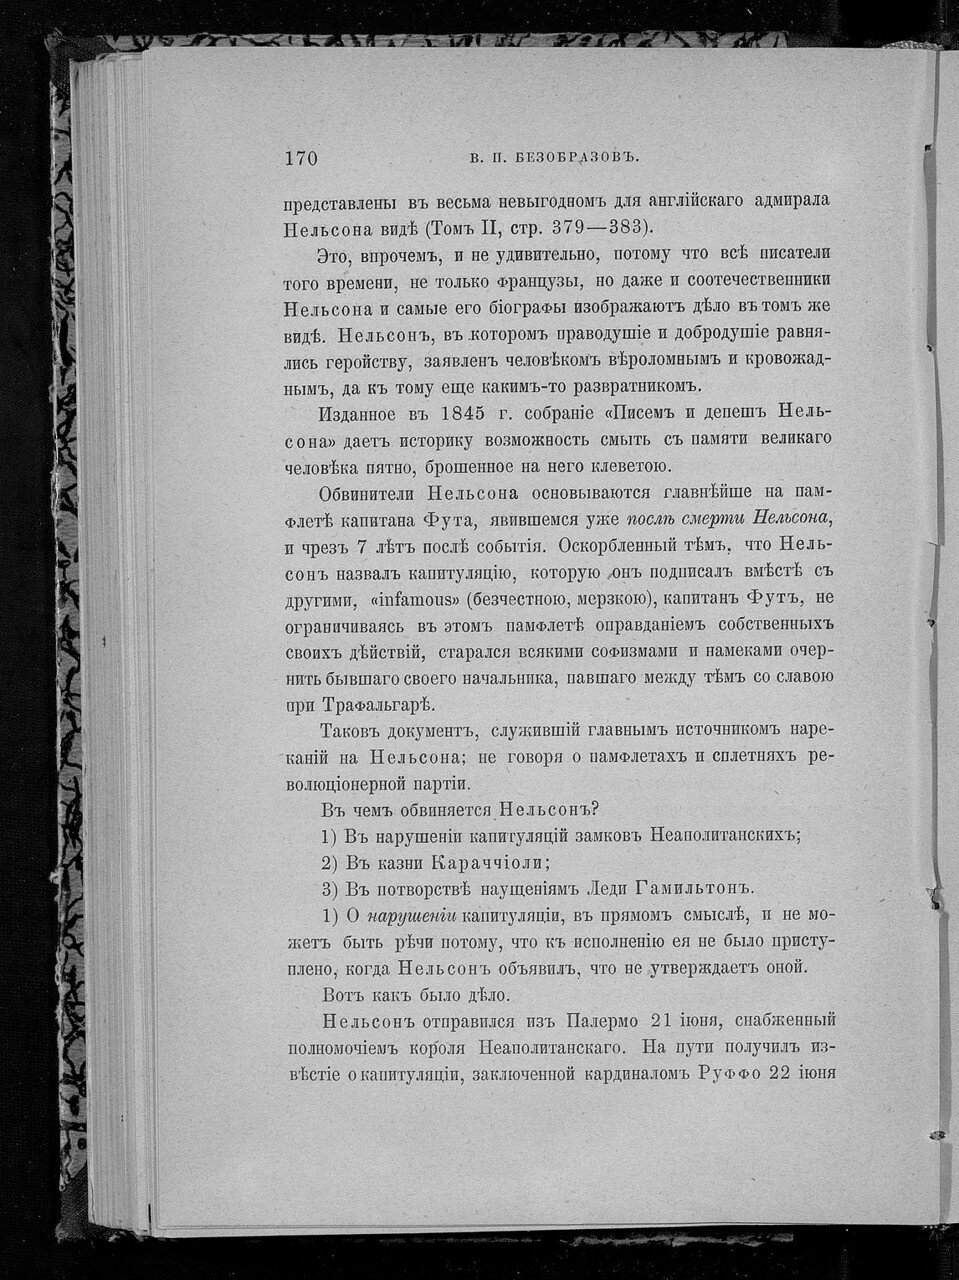 https://img-fotki.yandex.ru/get/879536/199368979.d6/0_21de48_4aa51a31_XXXL.jpg